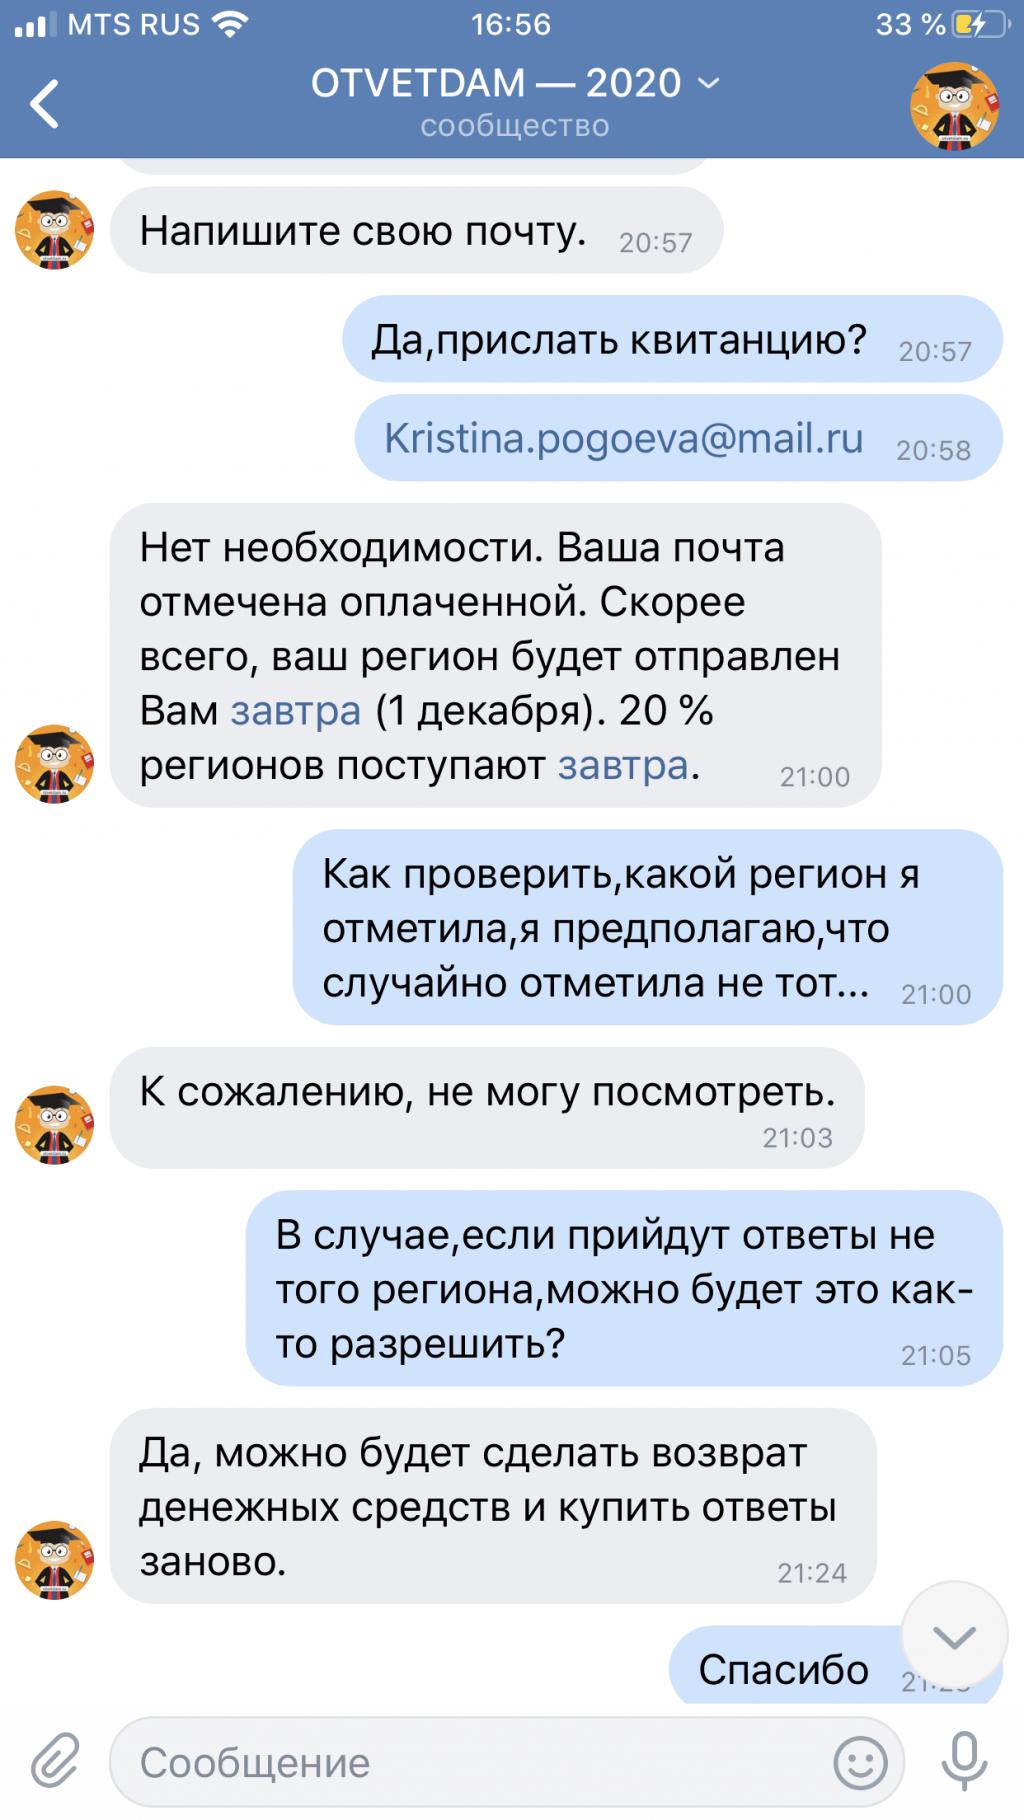 otvetdam.ru - Мошенники!!!!